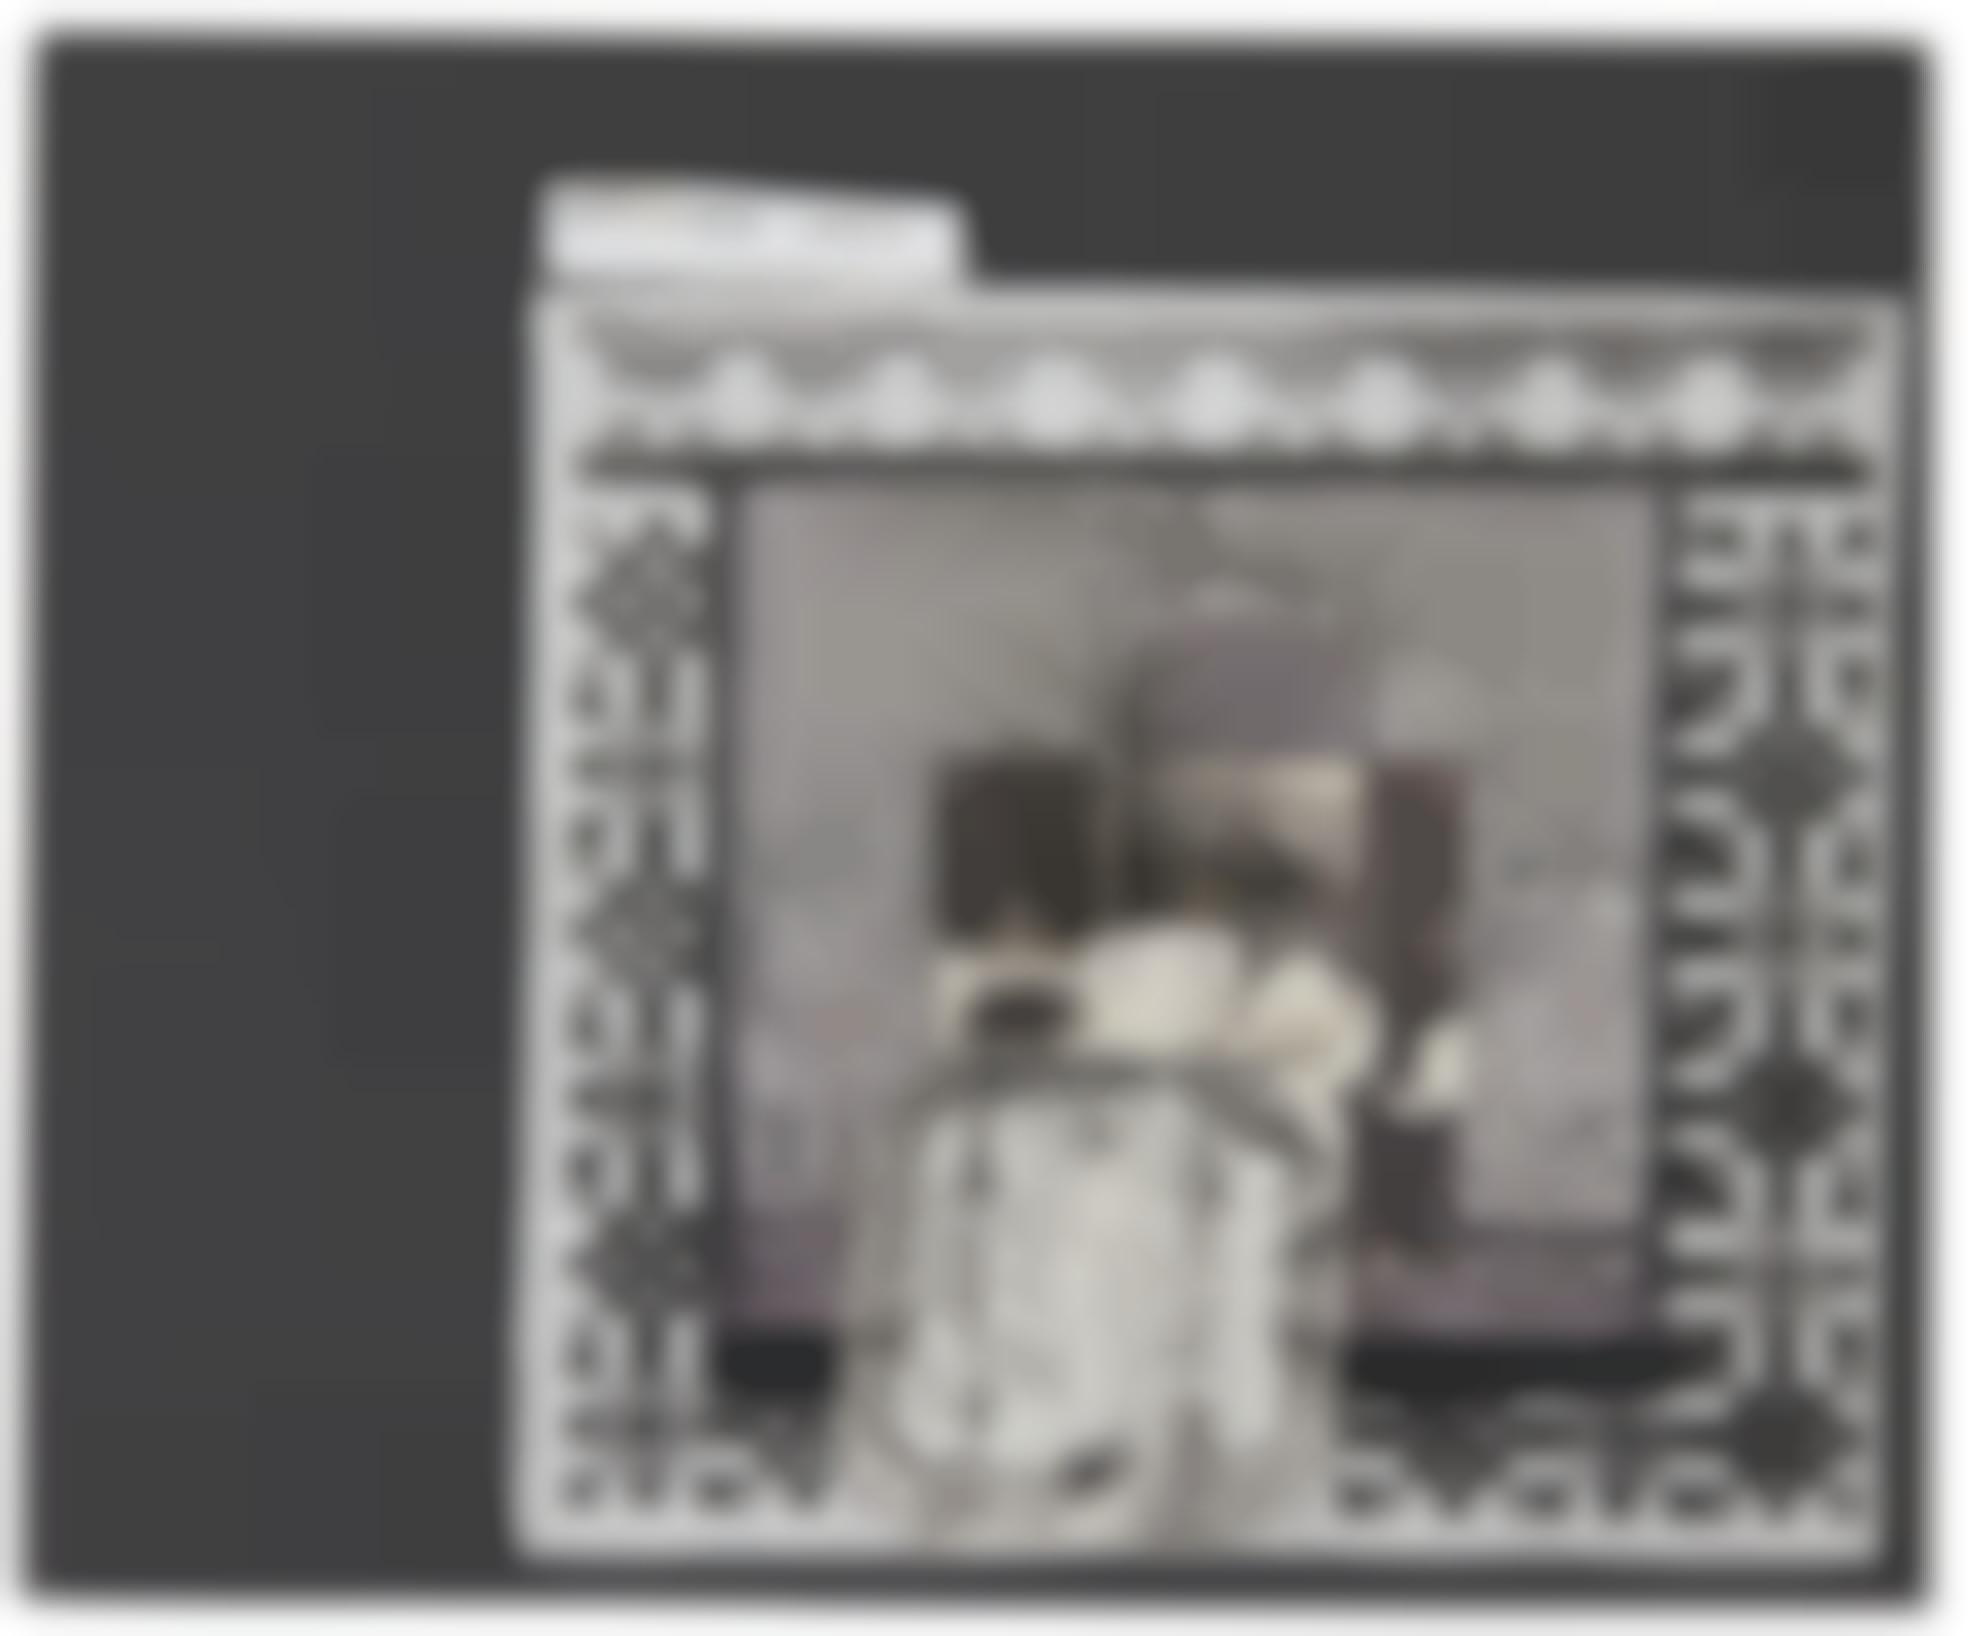 Sir Eduardo Paolozzi - Untitled Collage-1953